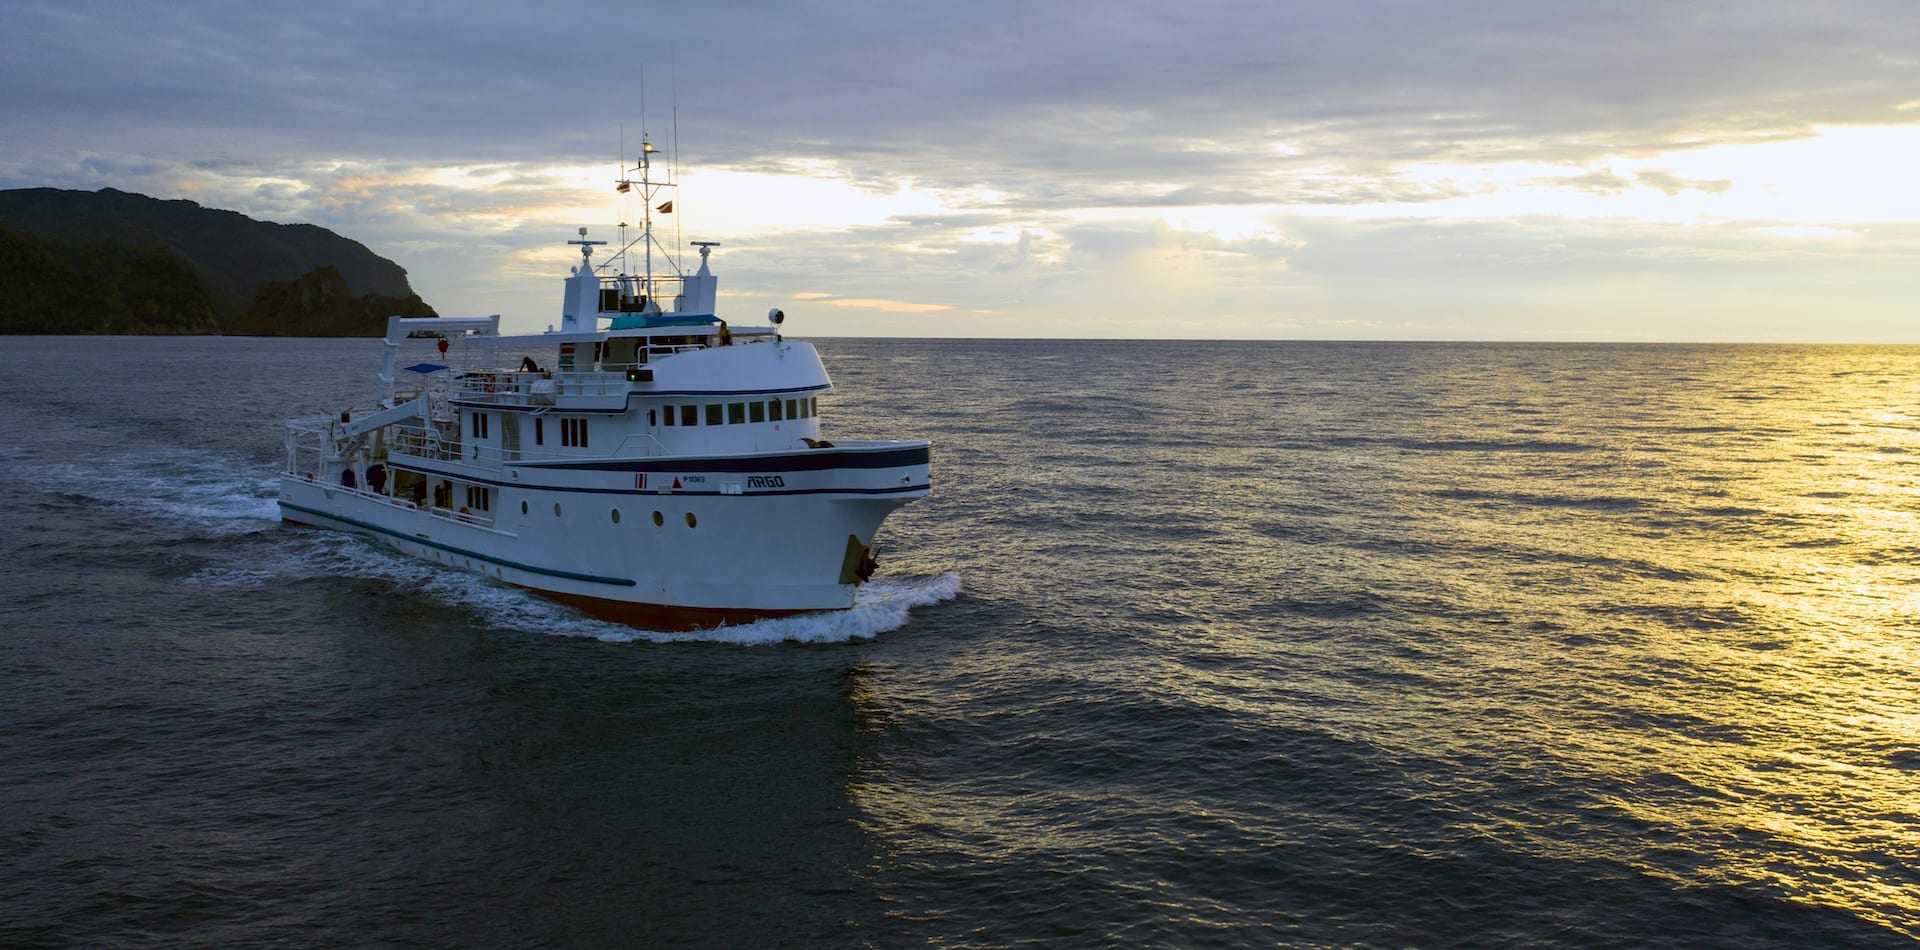 Hero Argo Yacht at Sunset